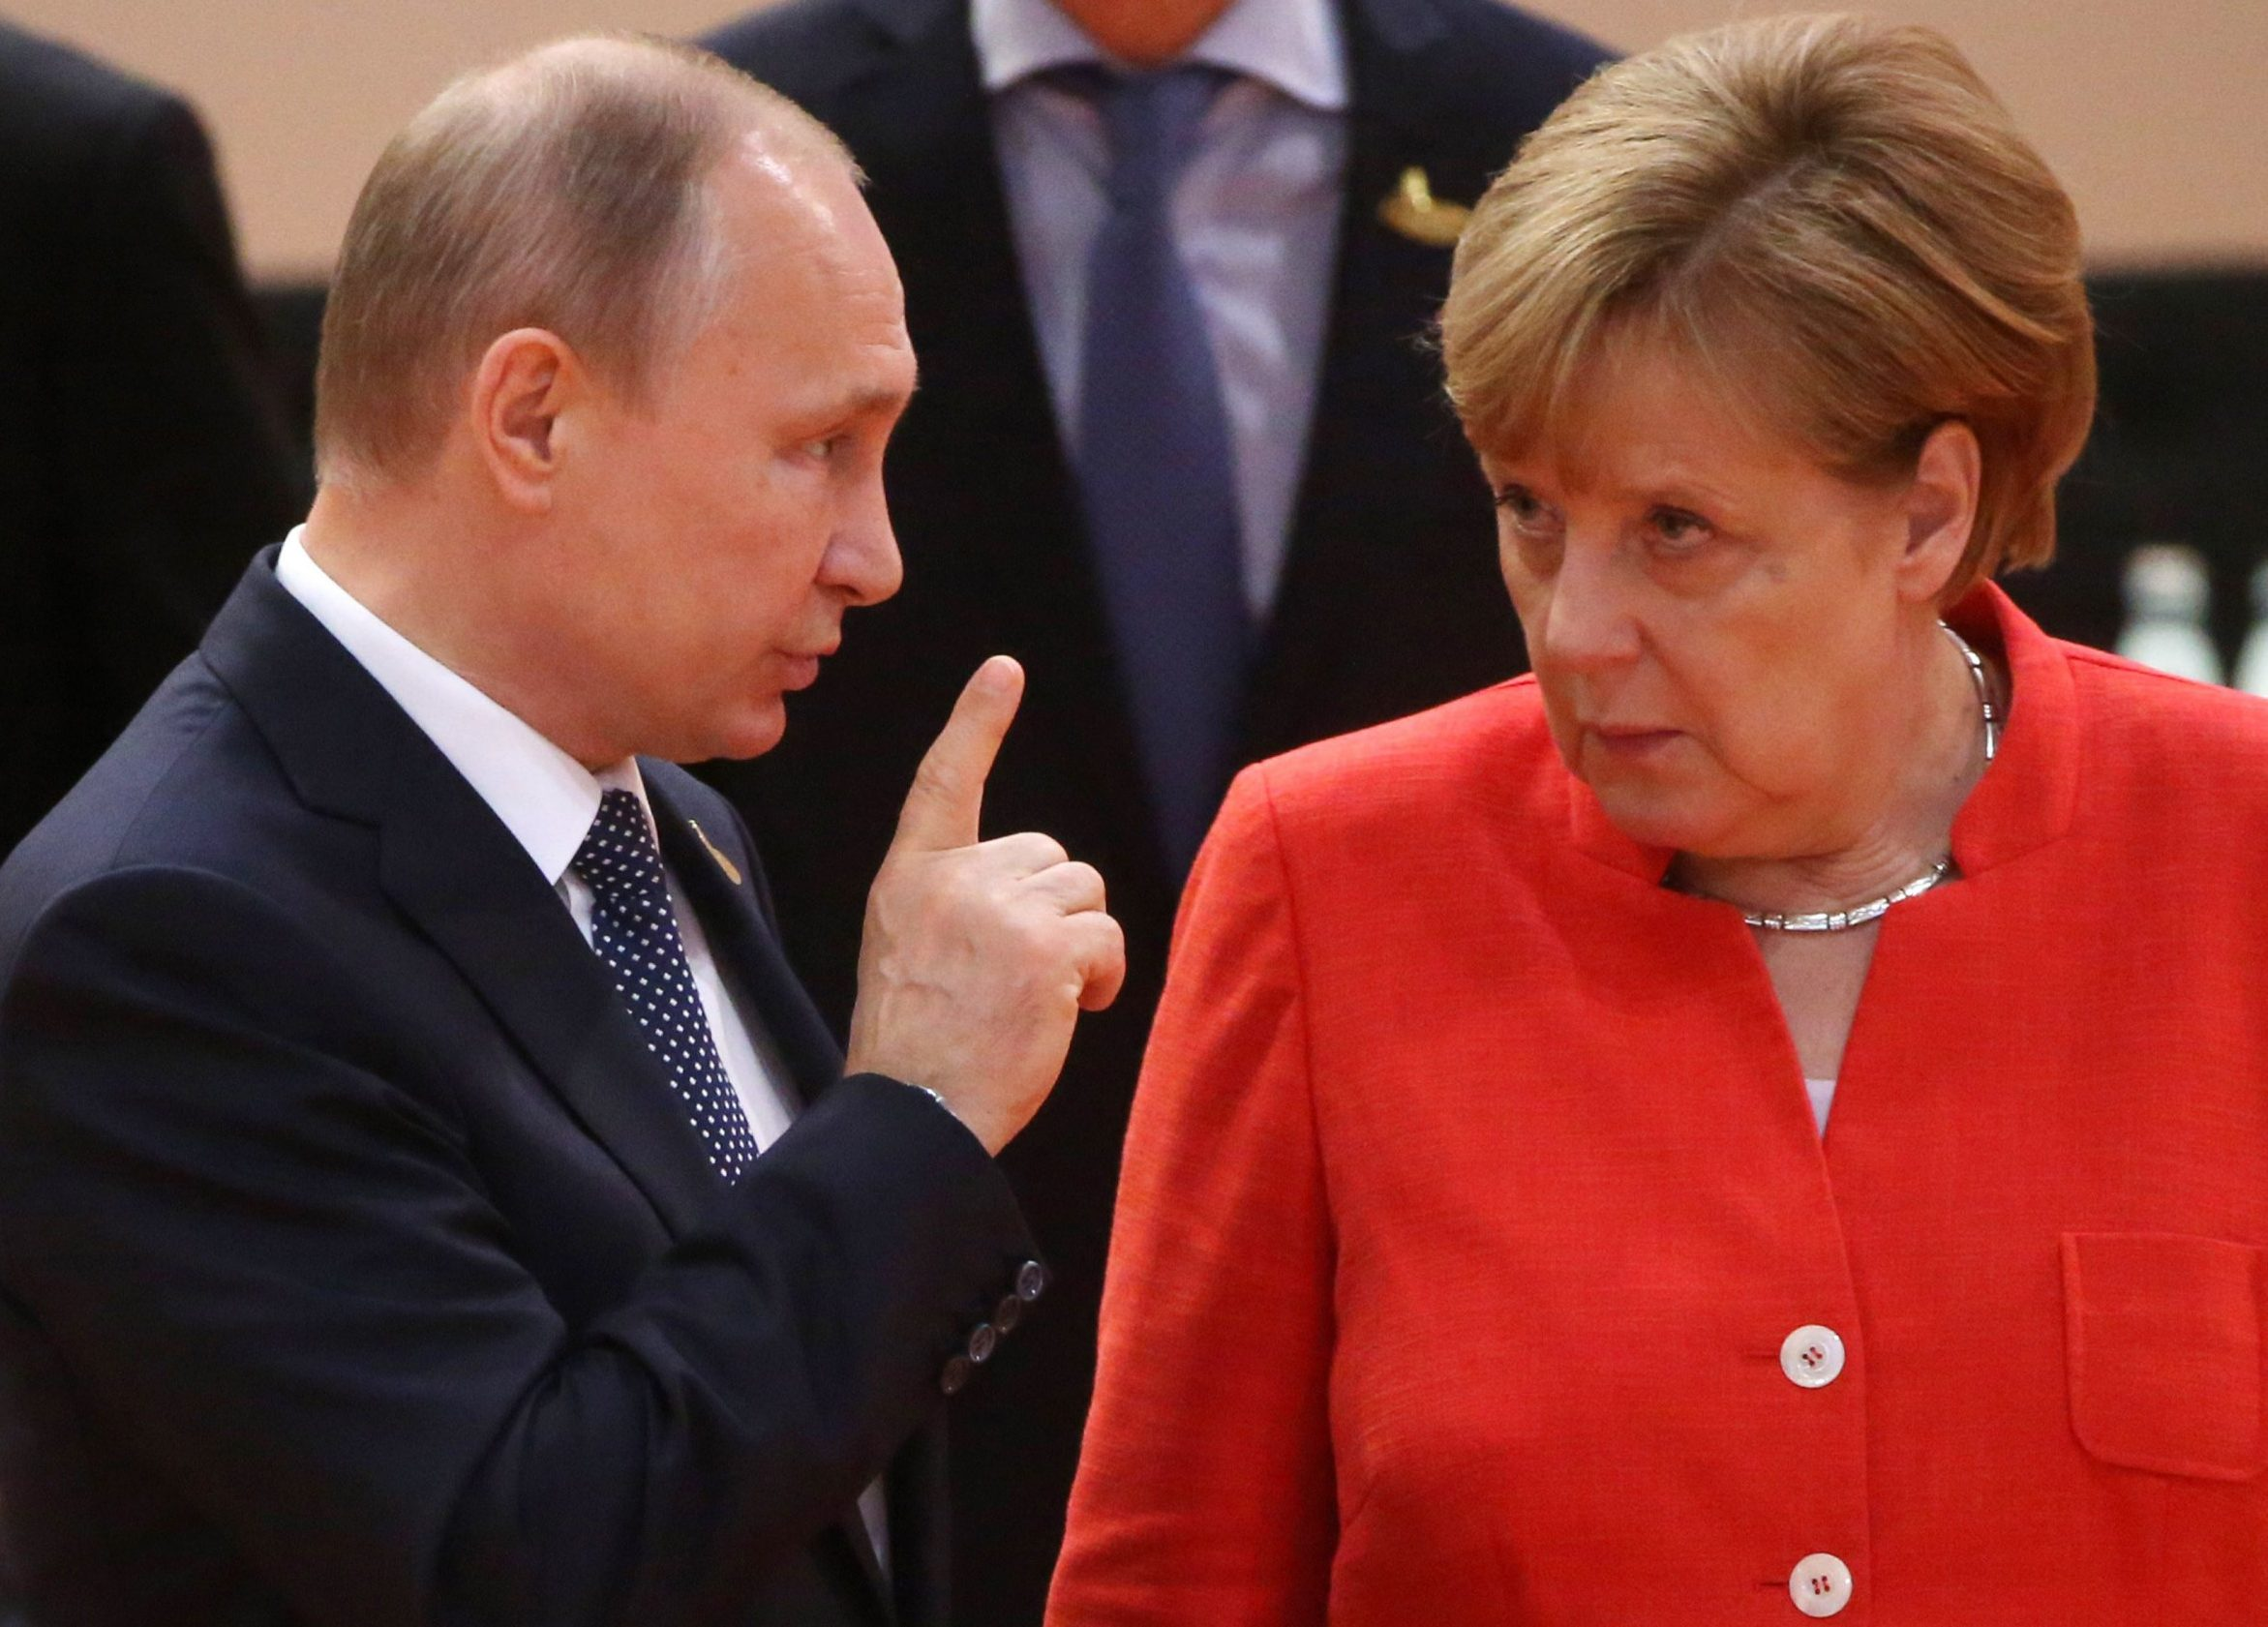 Angela Merkel gave Vladimir Putin the most savage eye roll at G20 summit